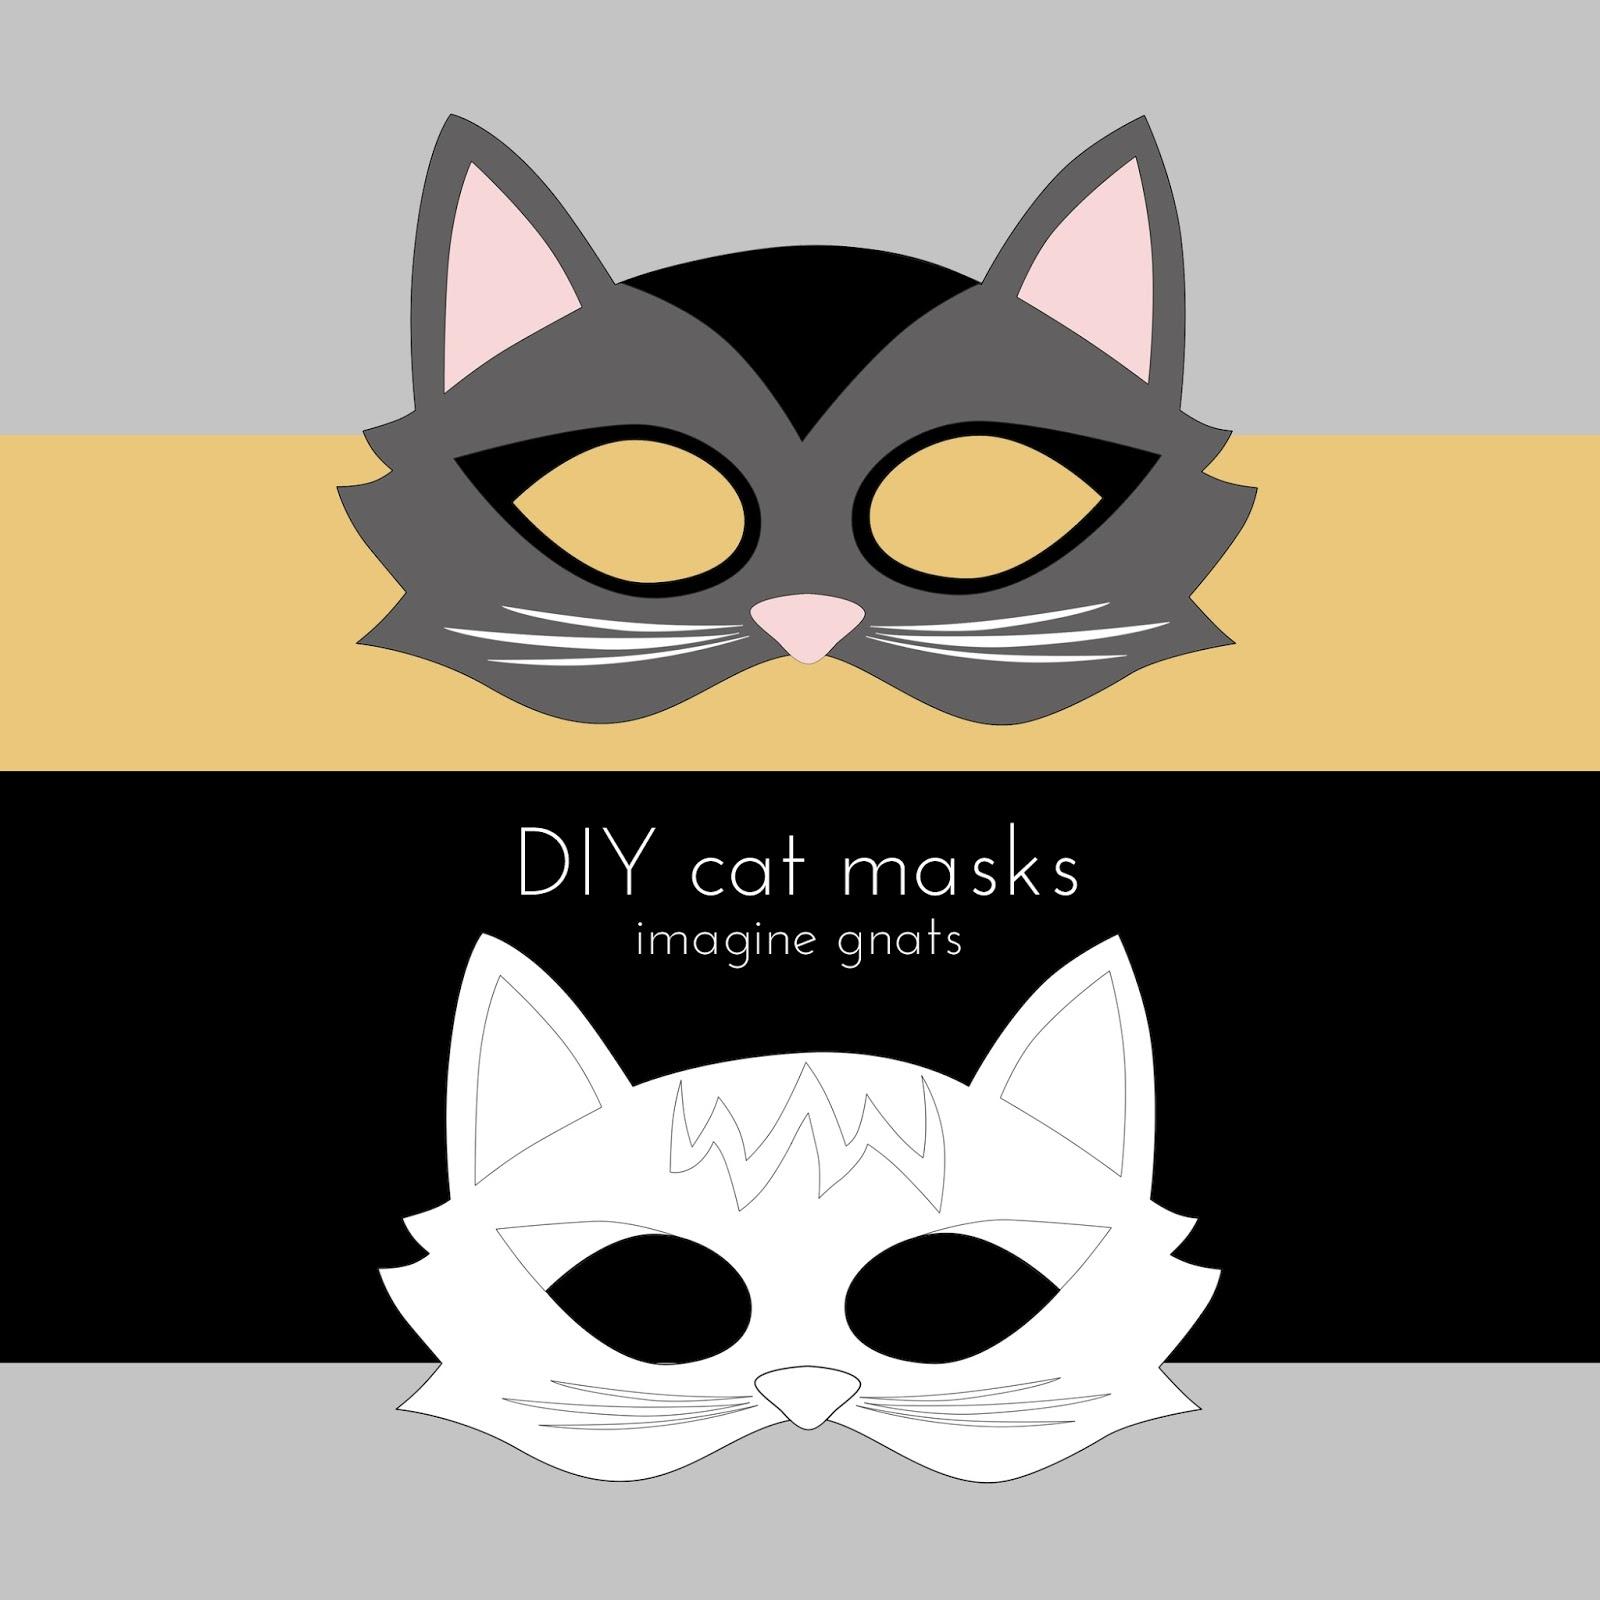 Imagine gnats craft handmade costumes cat mask tutorial for Caterpillar mask template